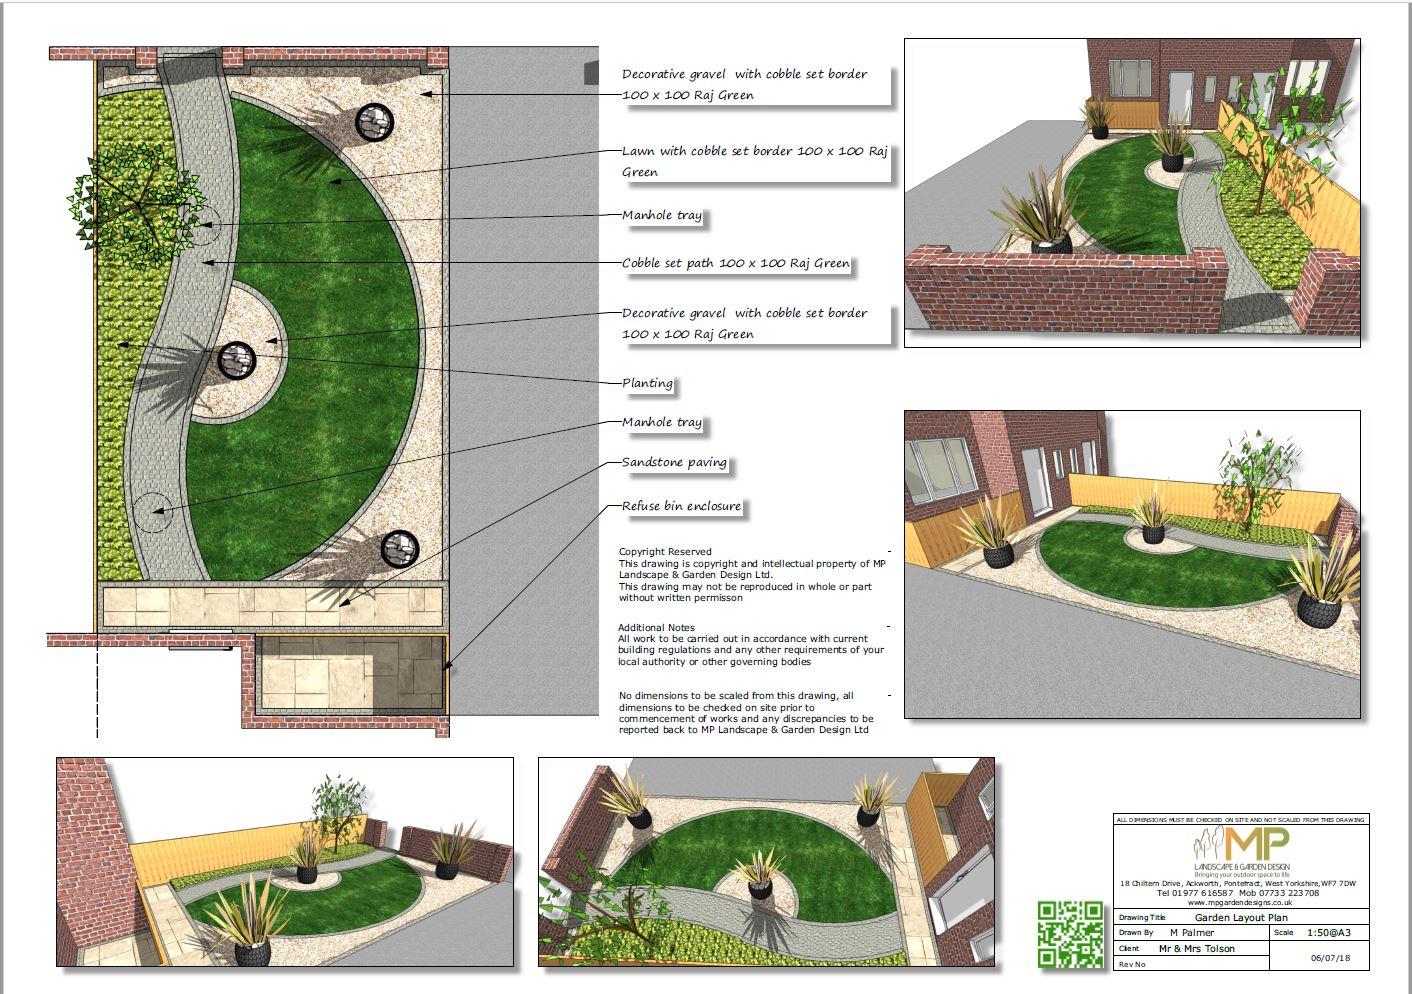 Garden layout plans for a front garden in Kippax, Leeds